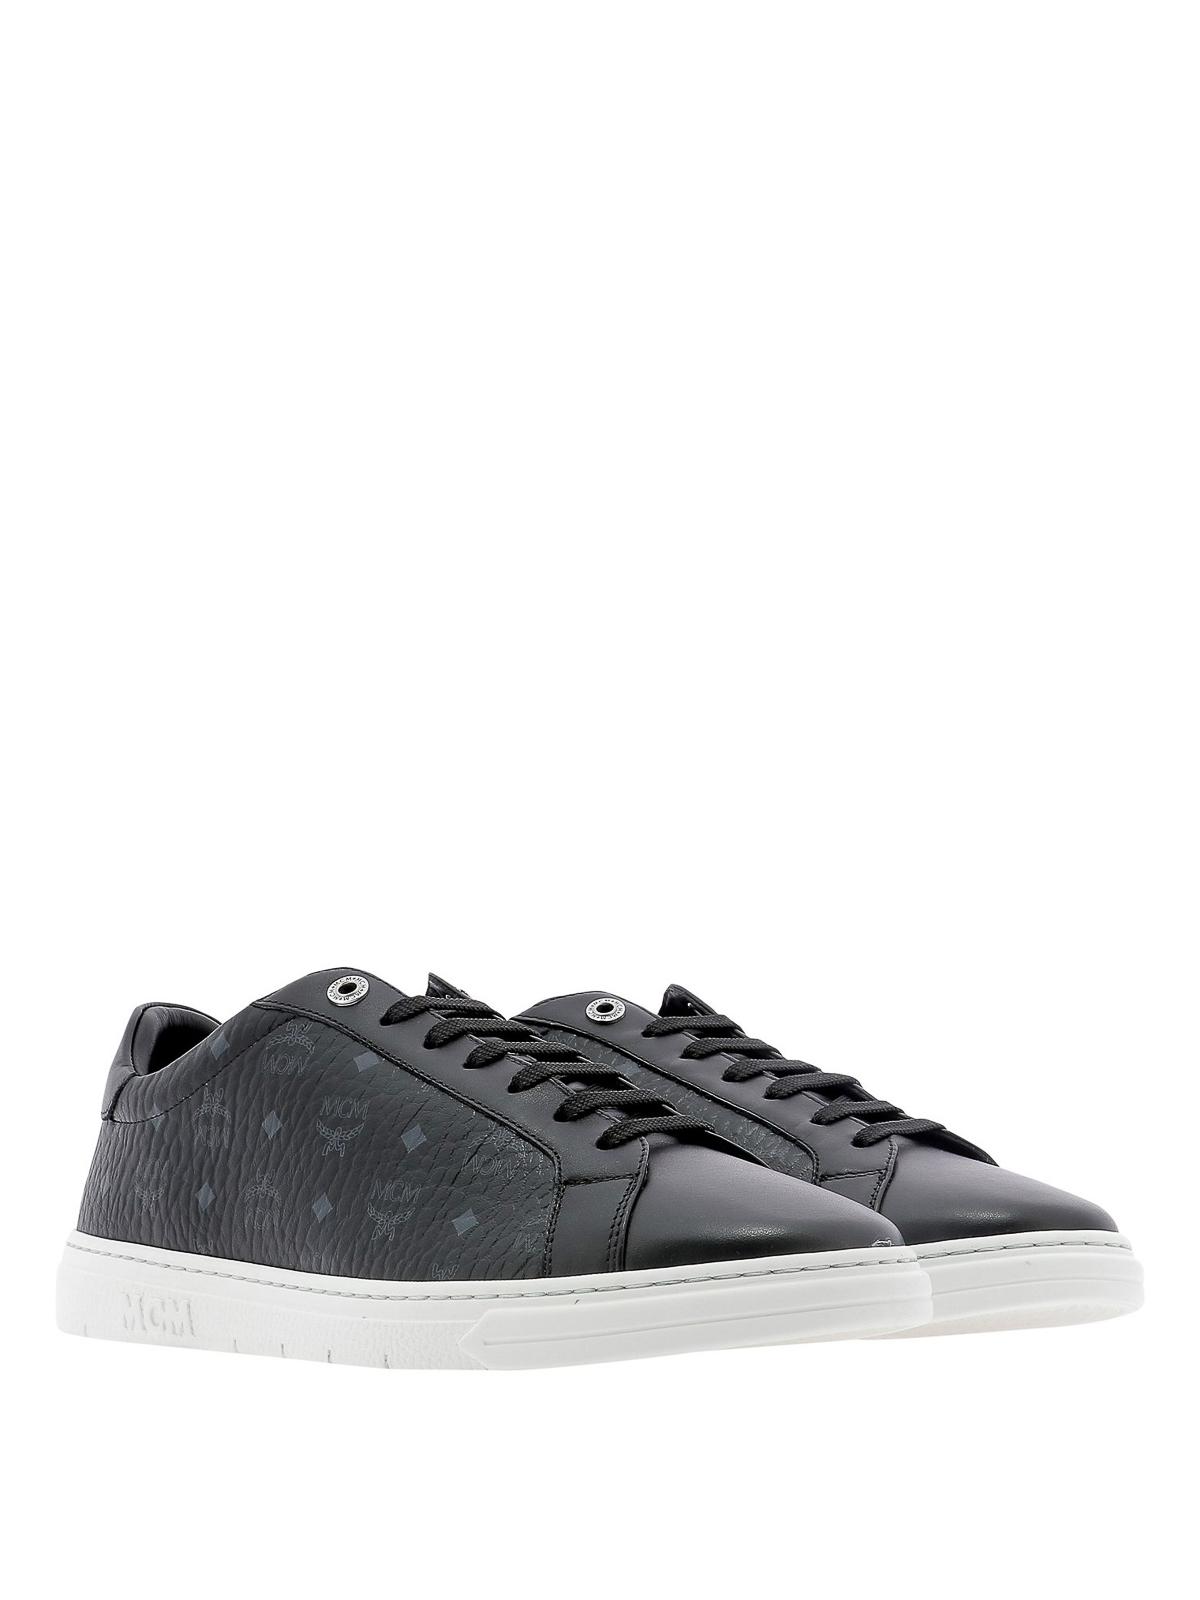 Mcm - Terrain Lo sneakers - trainers